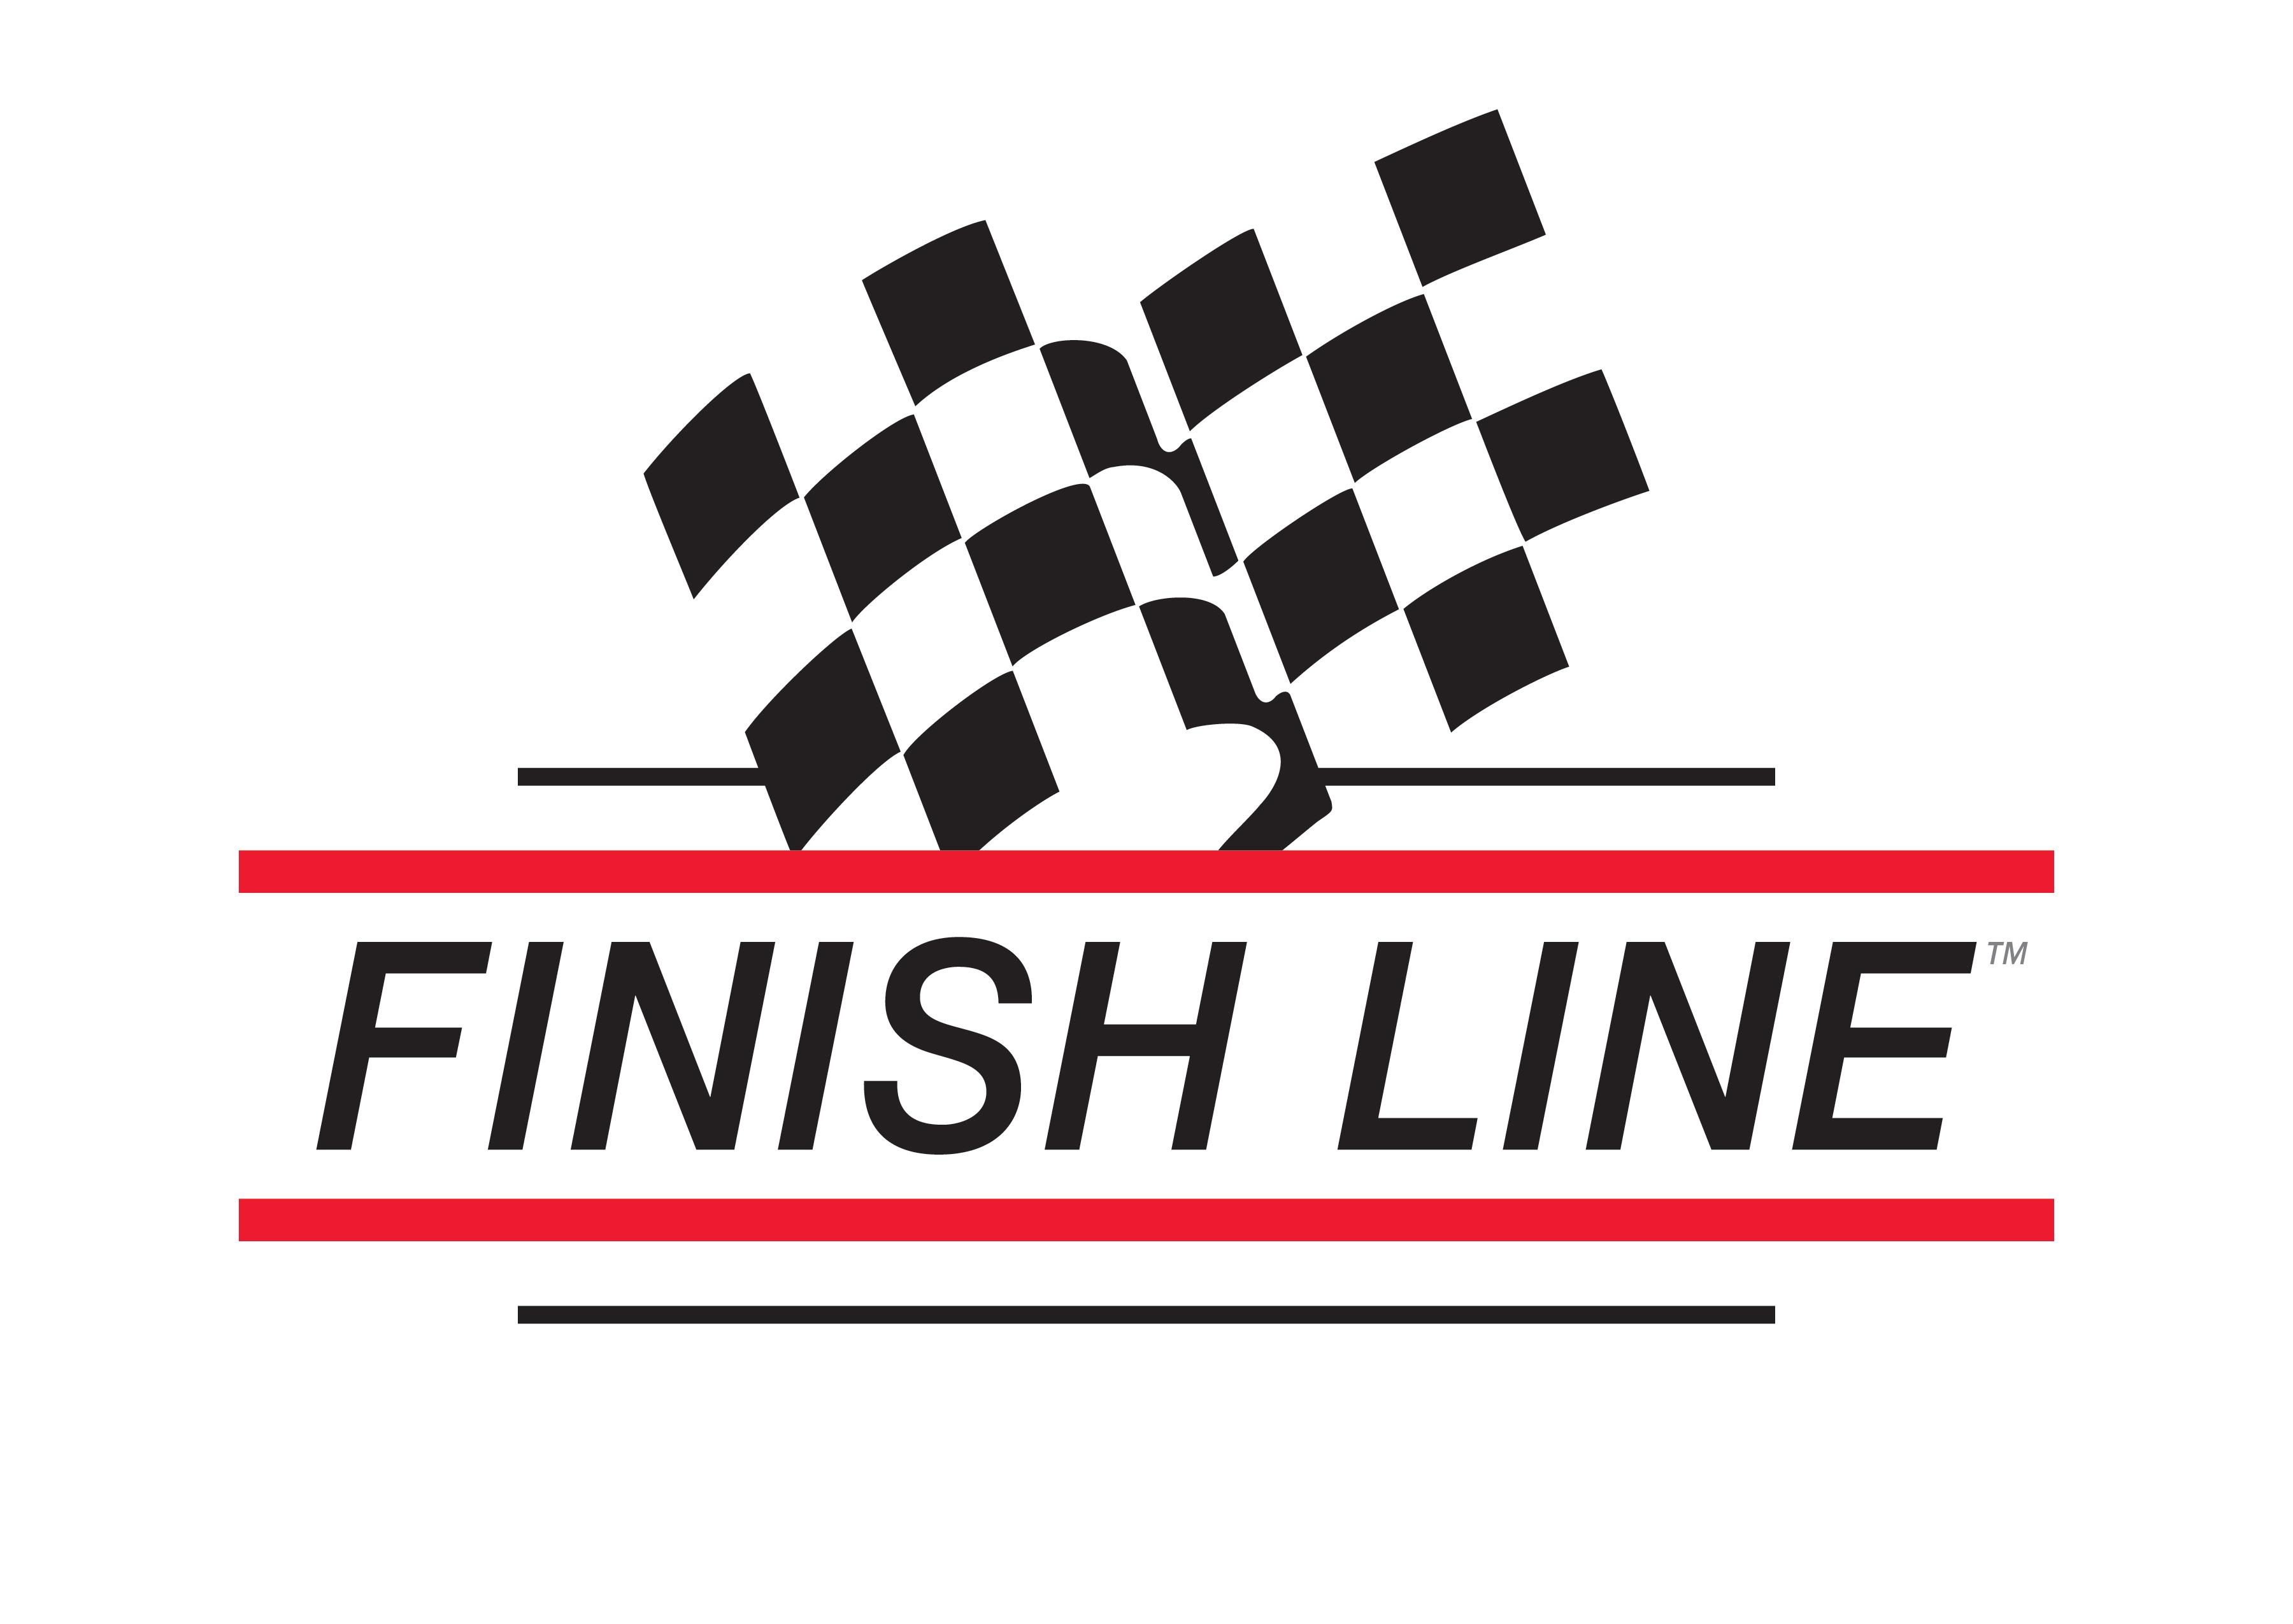 Racer clipart finish line On Finish clip Art Line